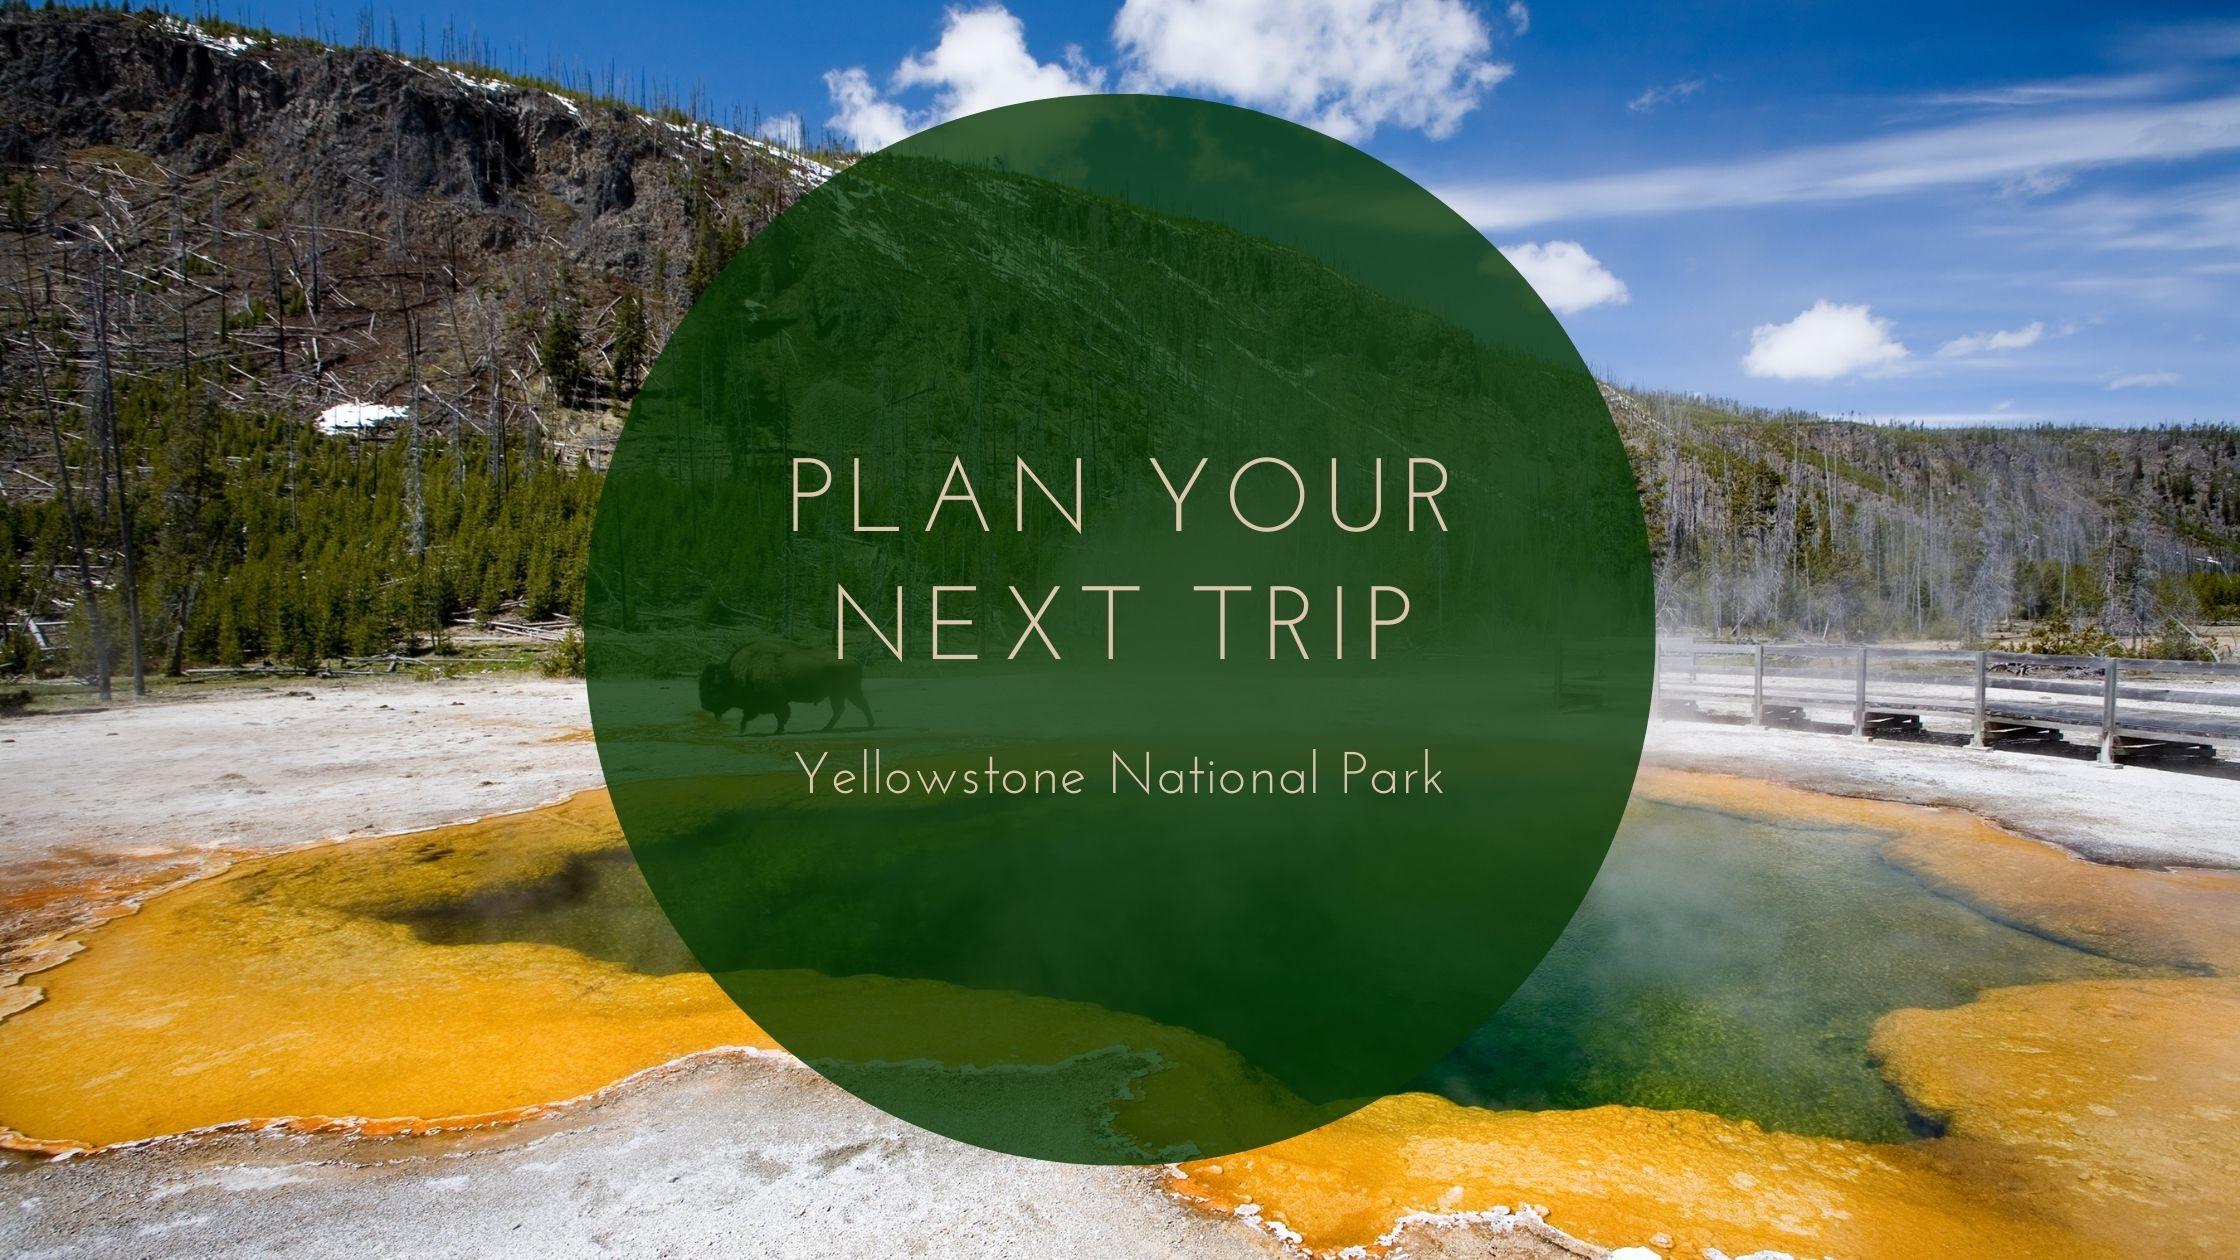 Plan Your Next Trip: Yellowstone National Park